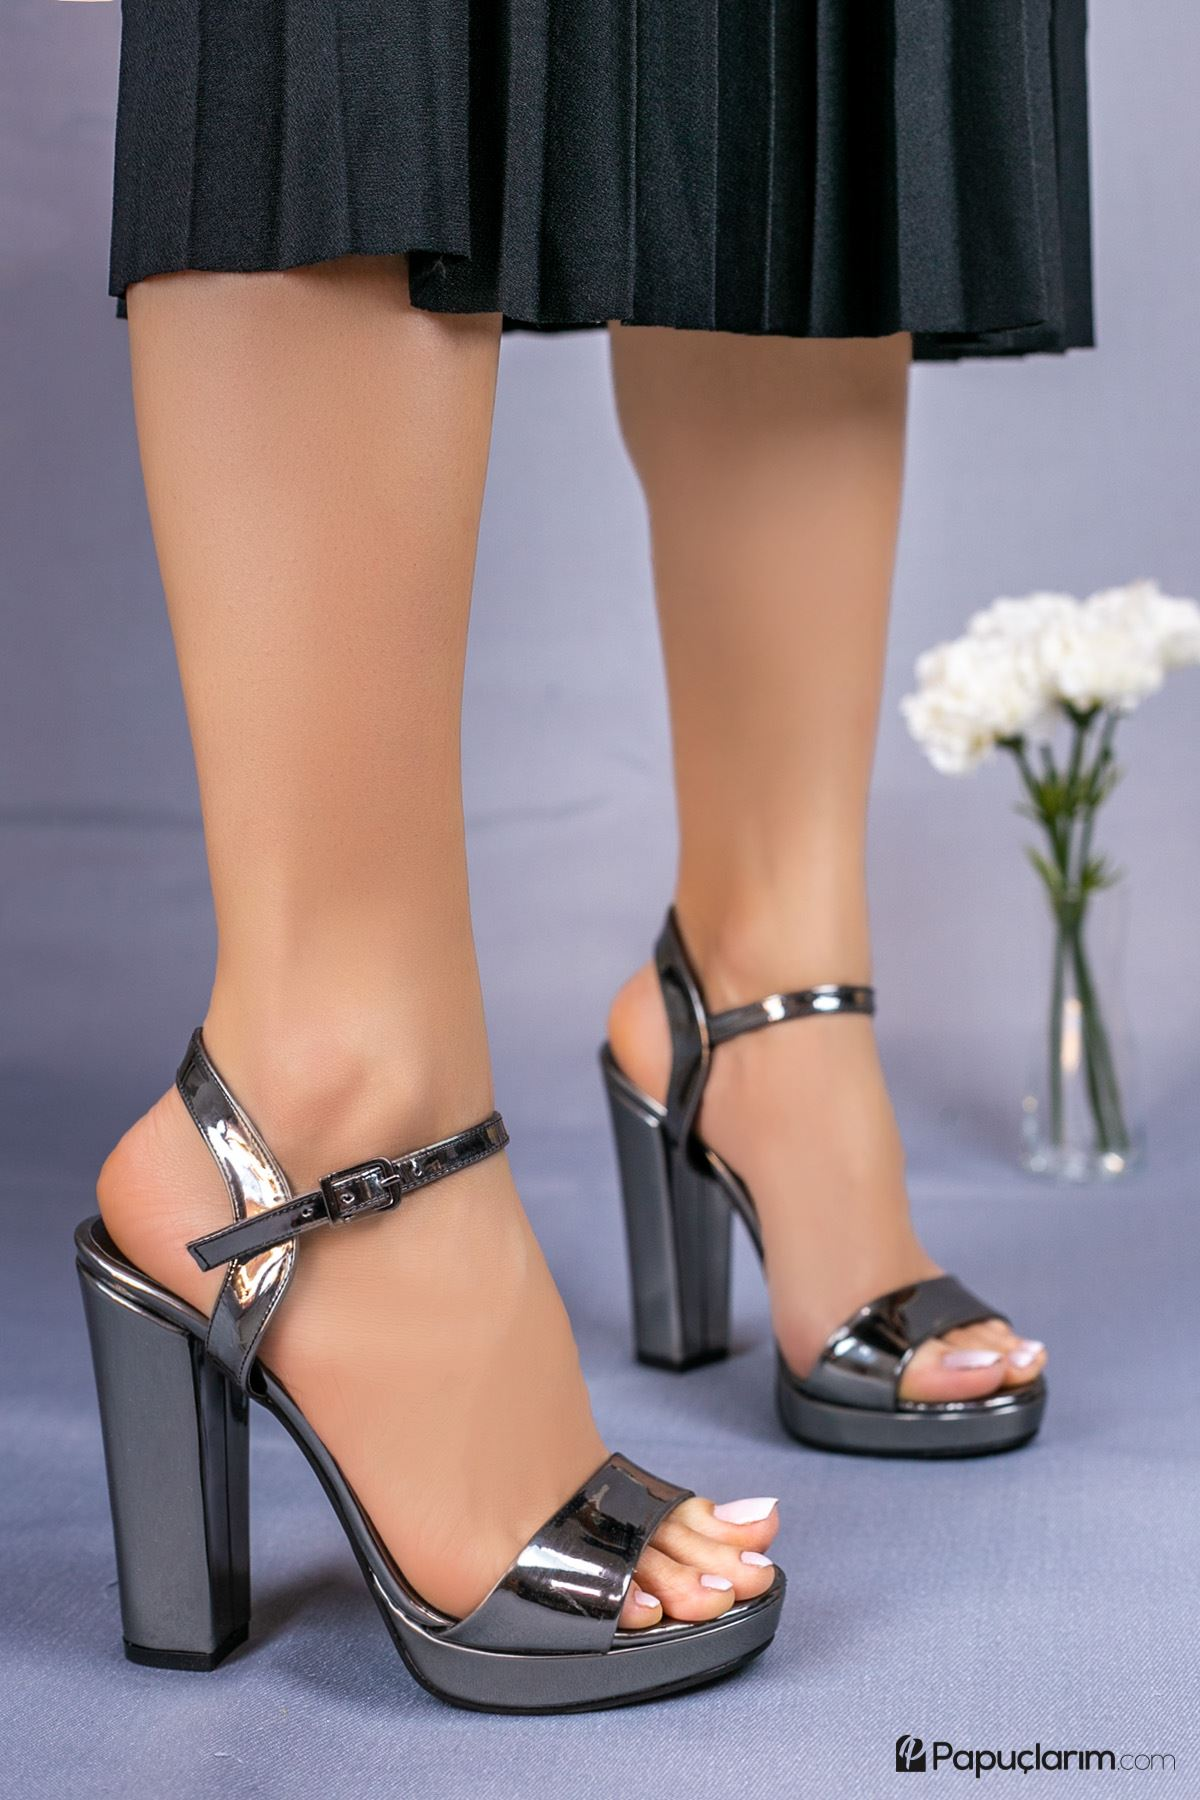 Alicia Platin Yüksek Platform Kadın Topuklu Ayakkabı